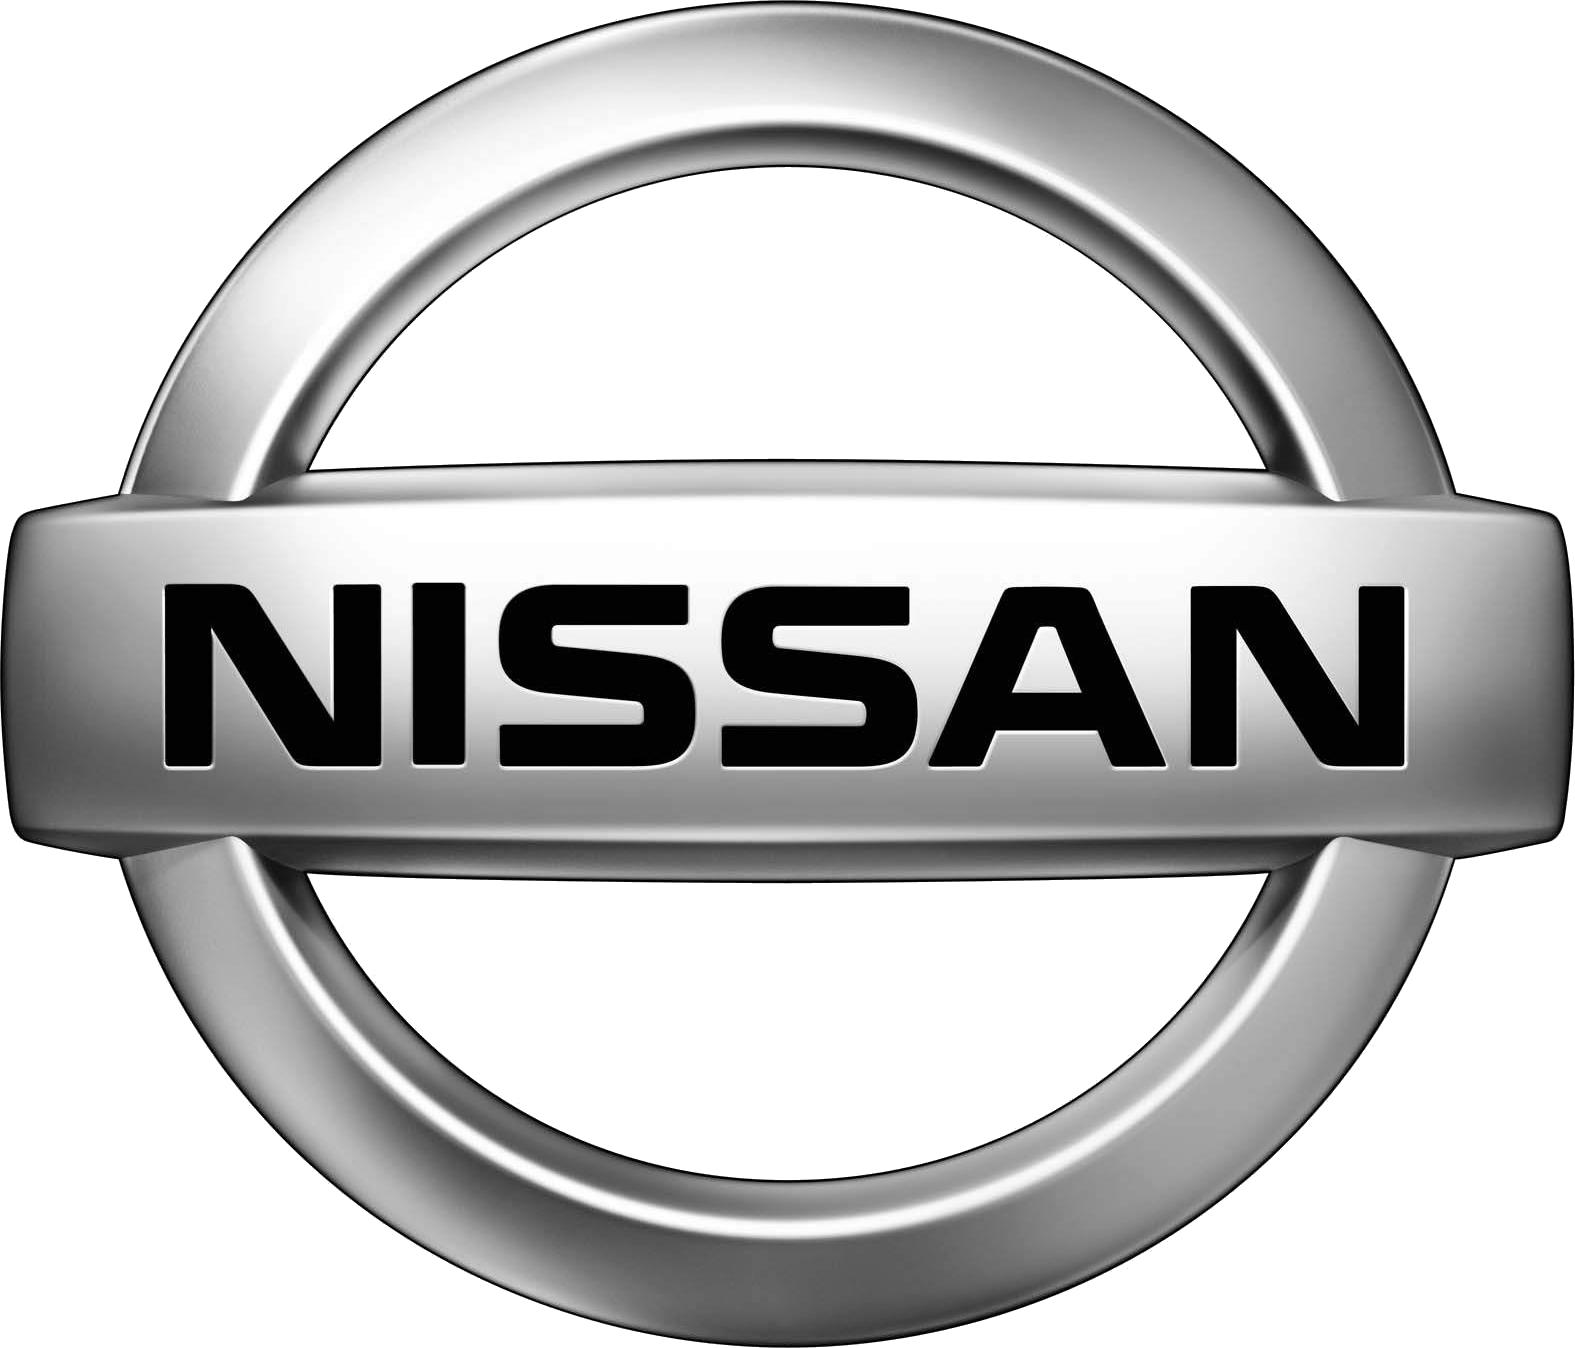 Nissan Motor Company Ltd, usually shortened to Nissan, is